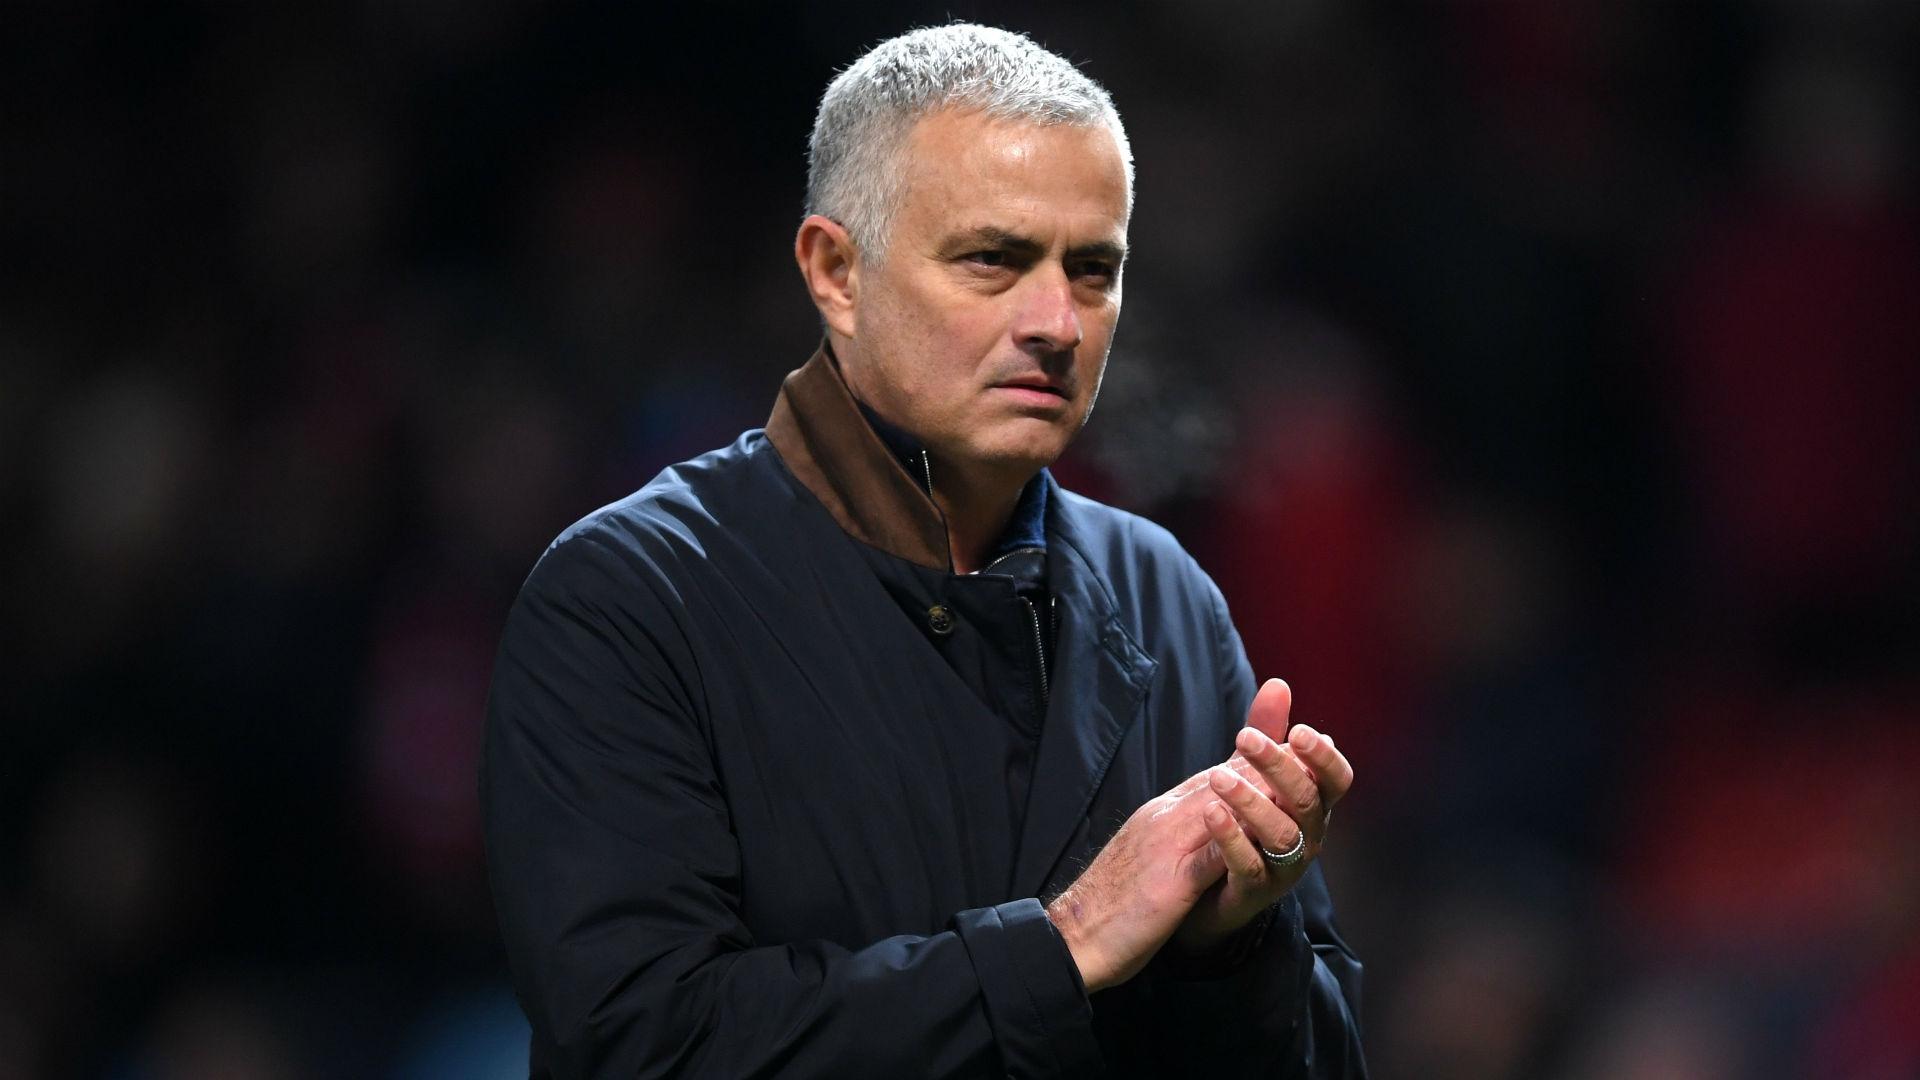 Jose Mourinho - Manchester United manager